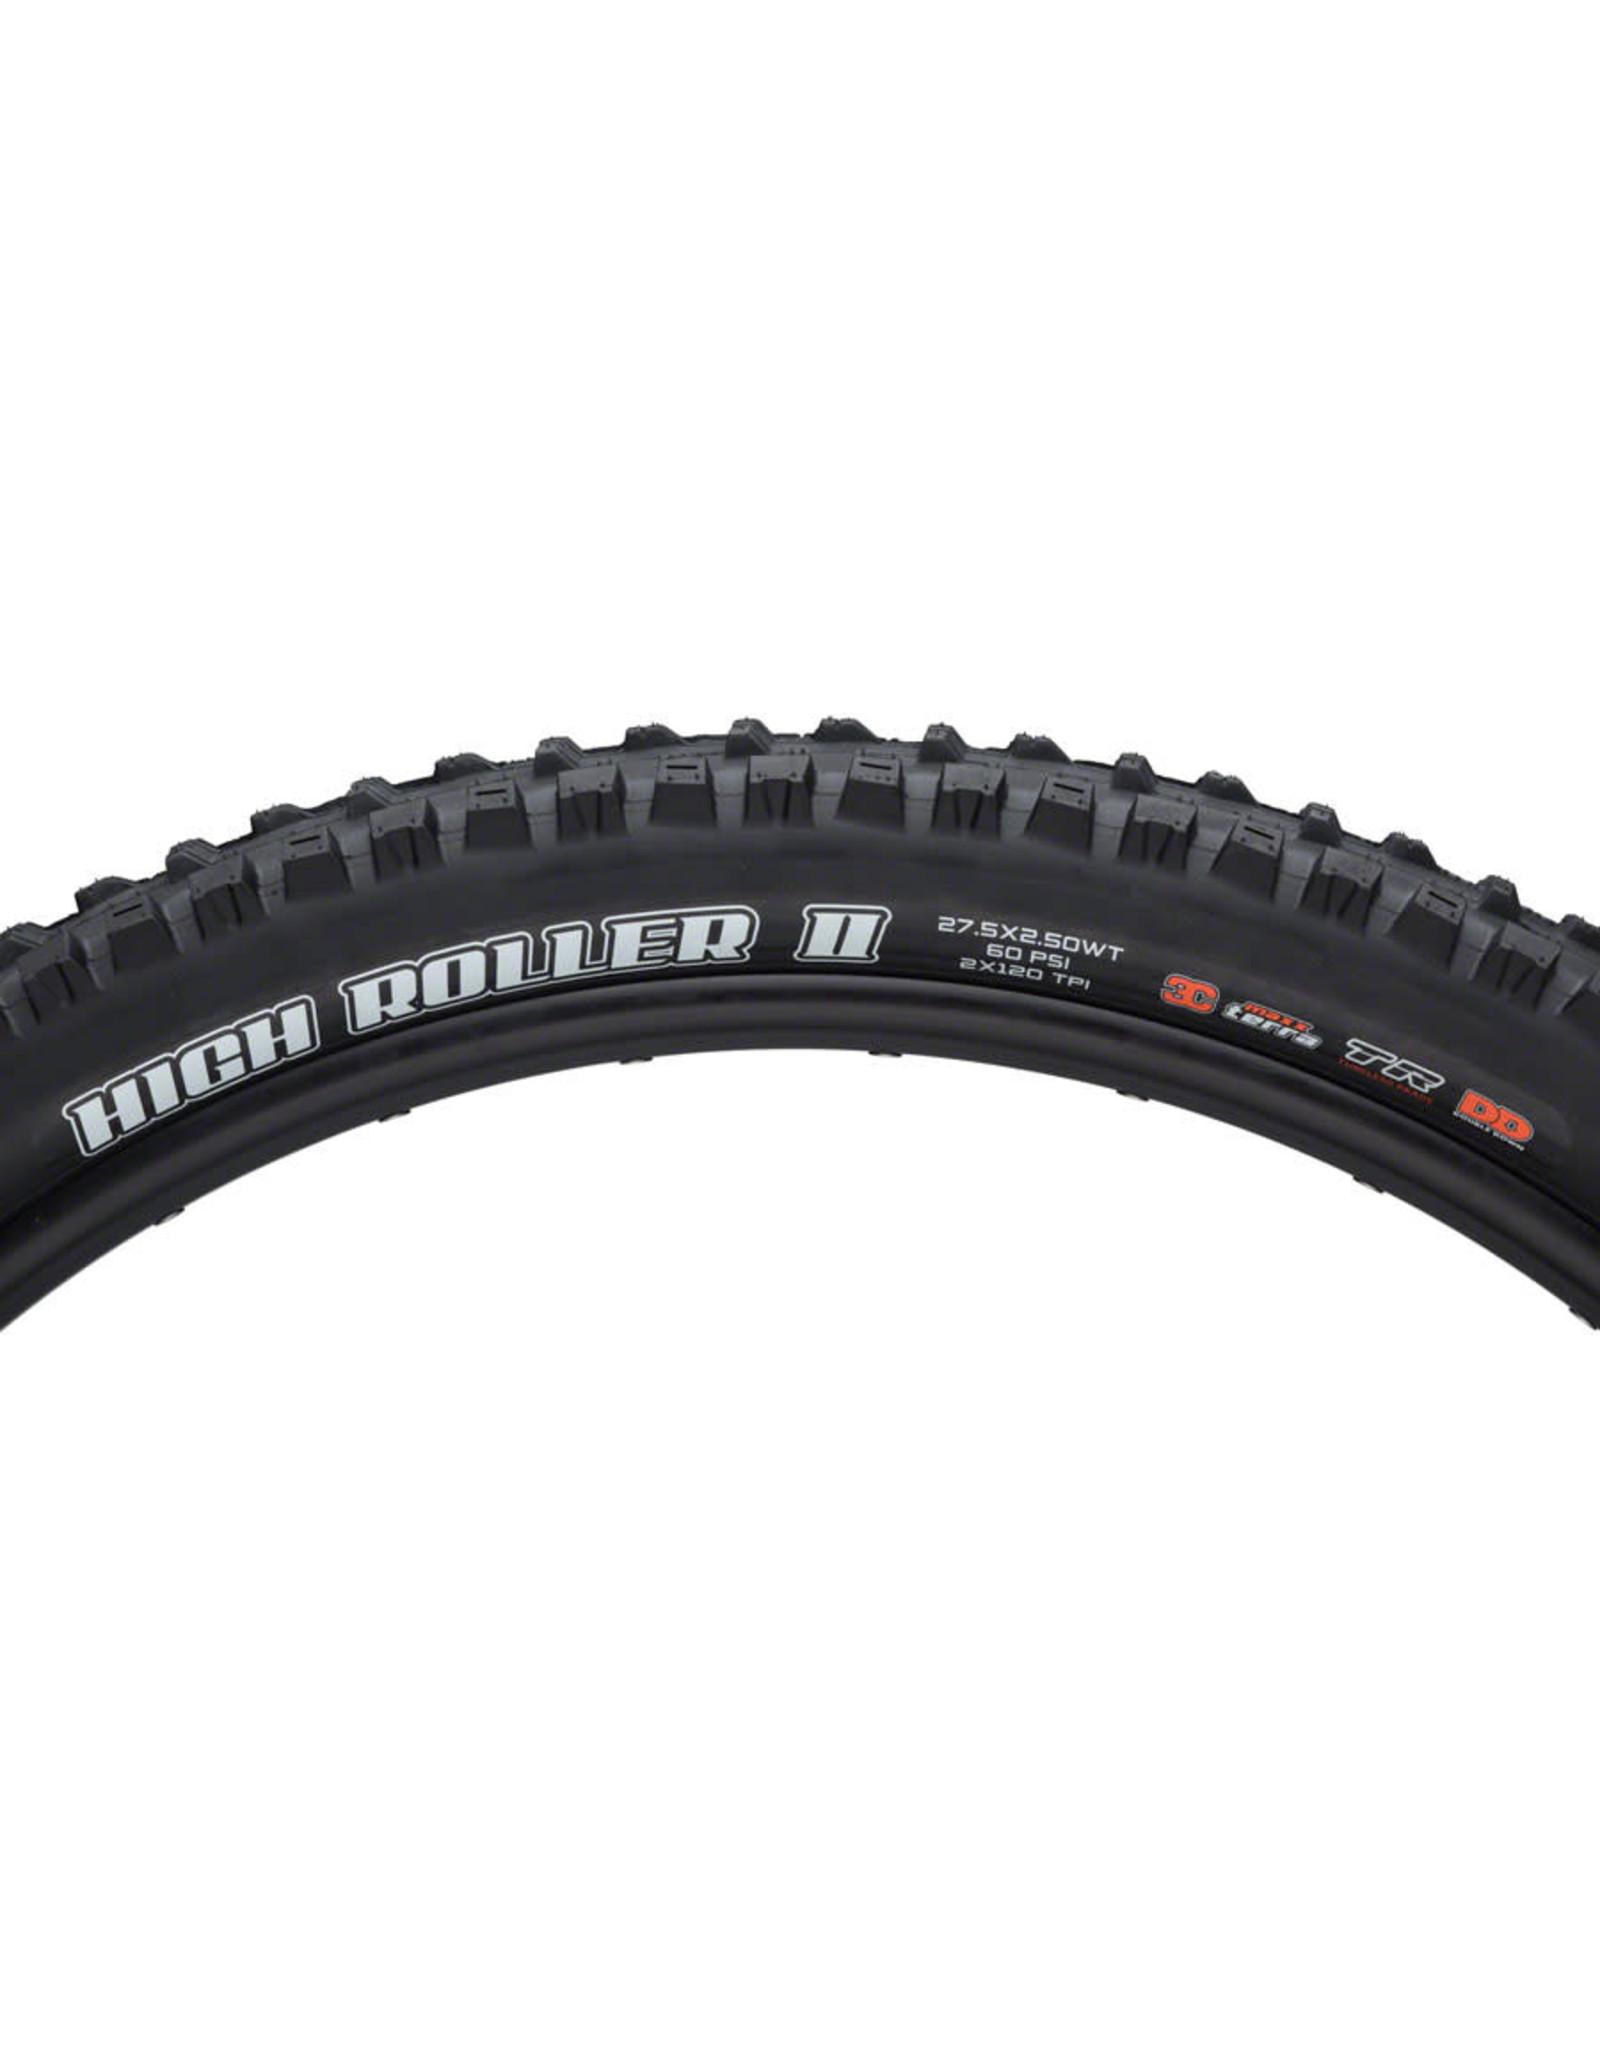 Maxxis Maxxis High Roller II Tire - 27.5 x 2.6, Tubeless, Folding, Black, Dual, EXO, Wide Trail